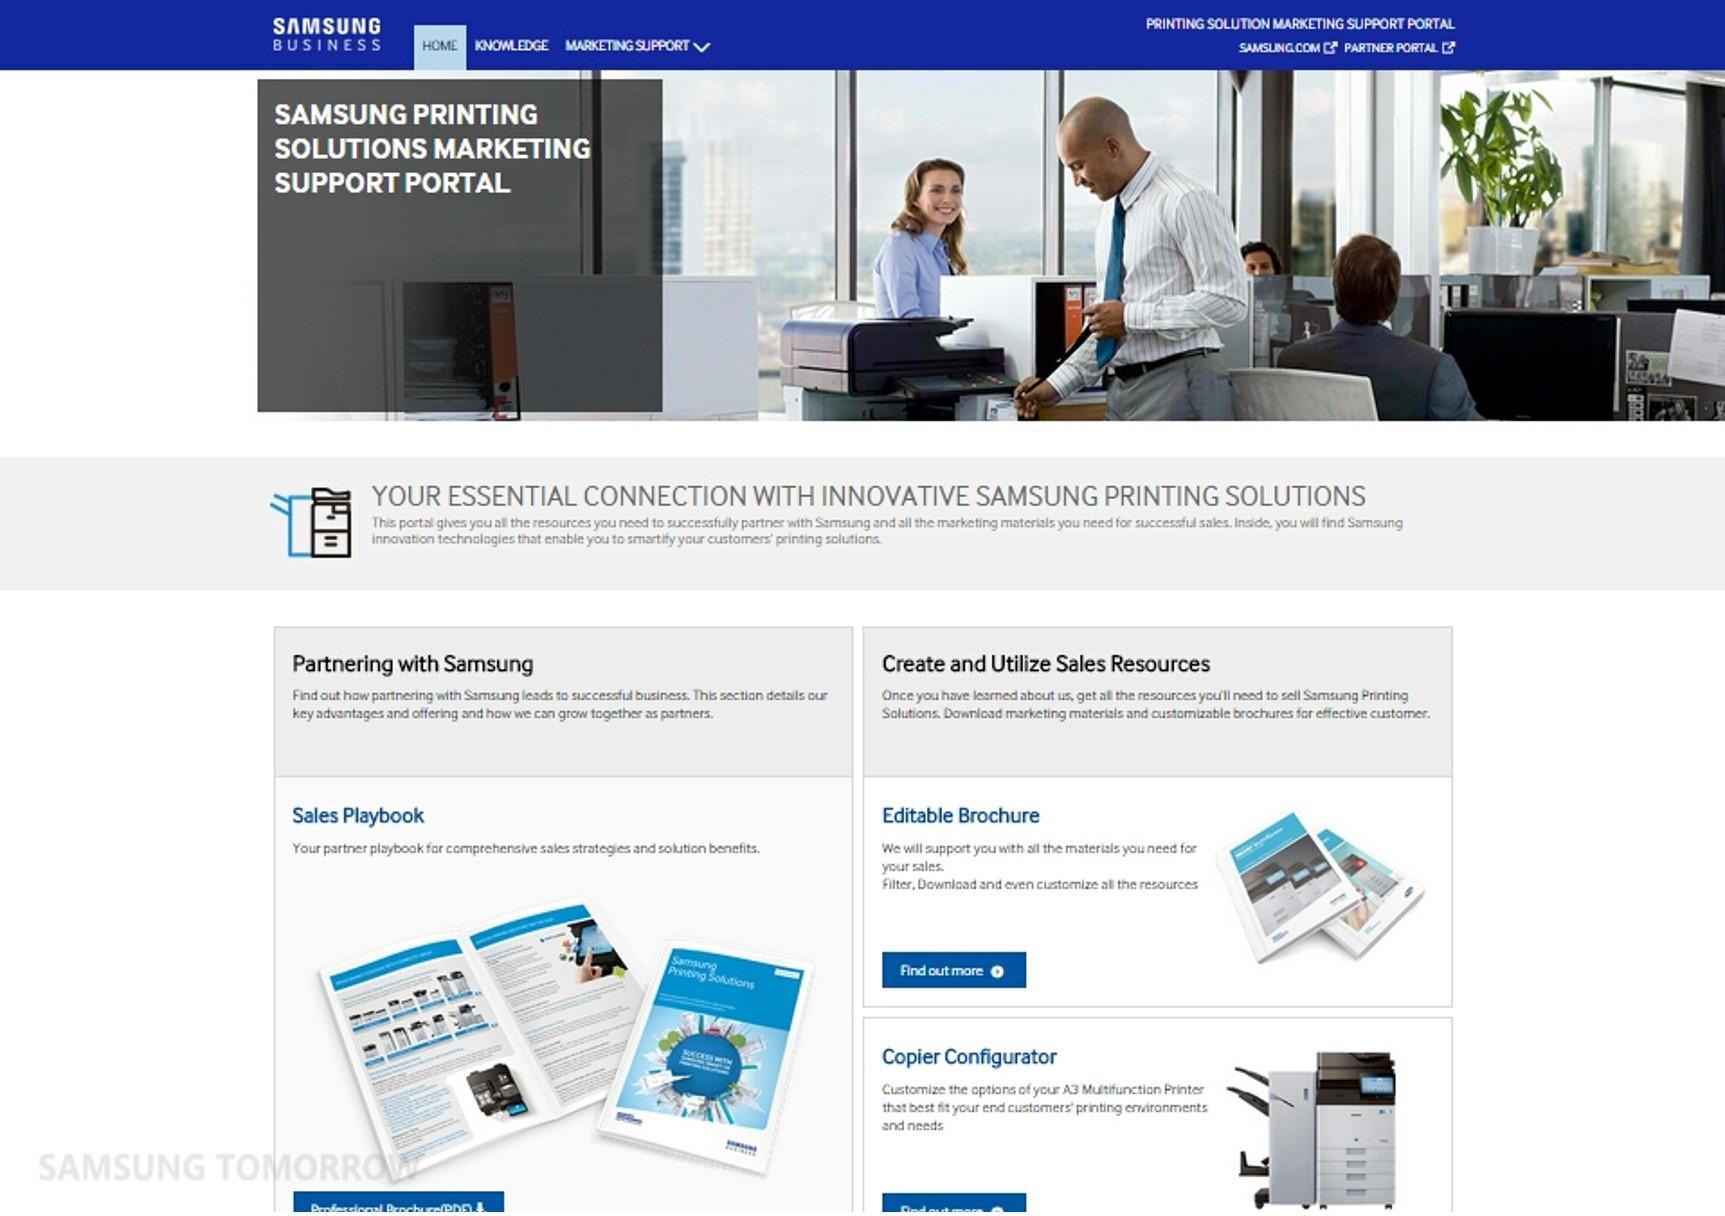 samsung printing marketing support portal